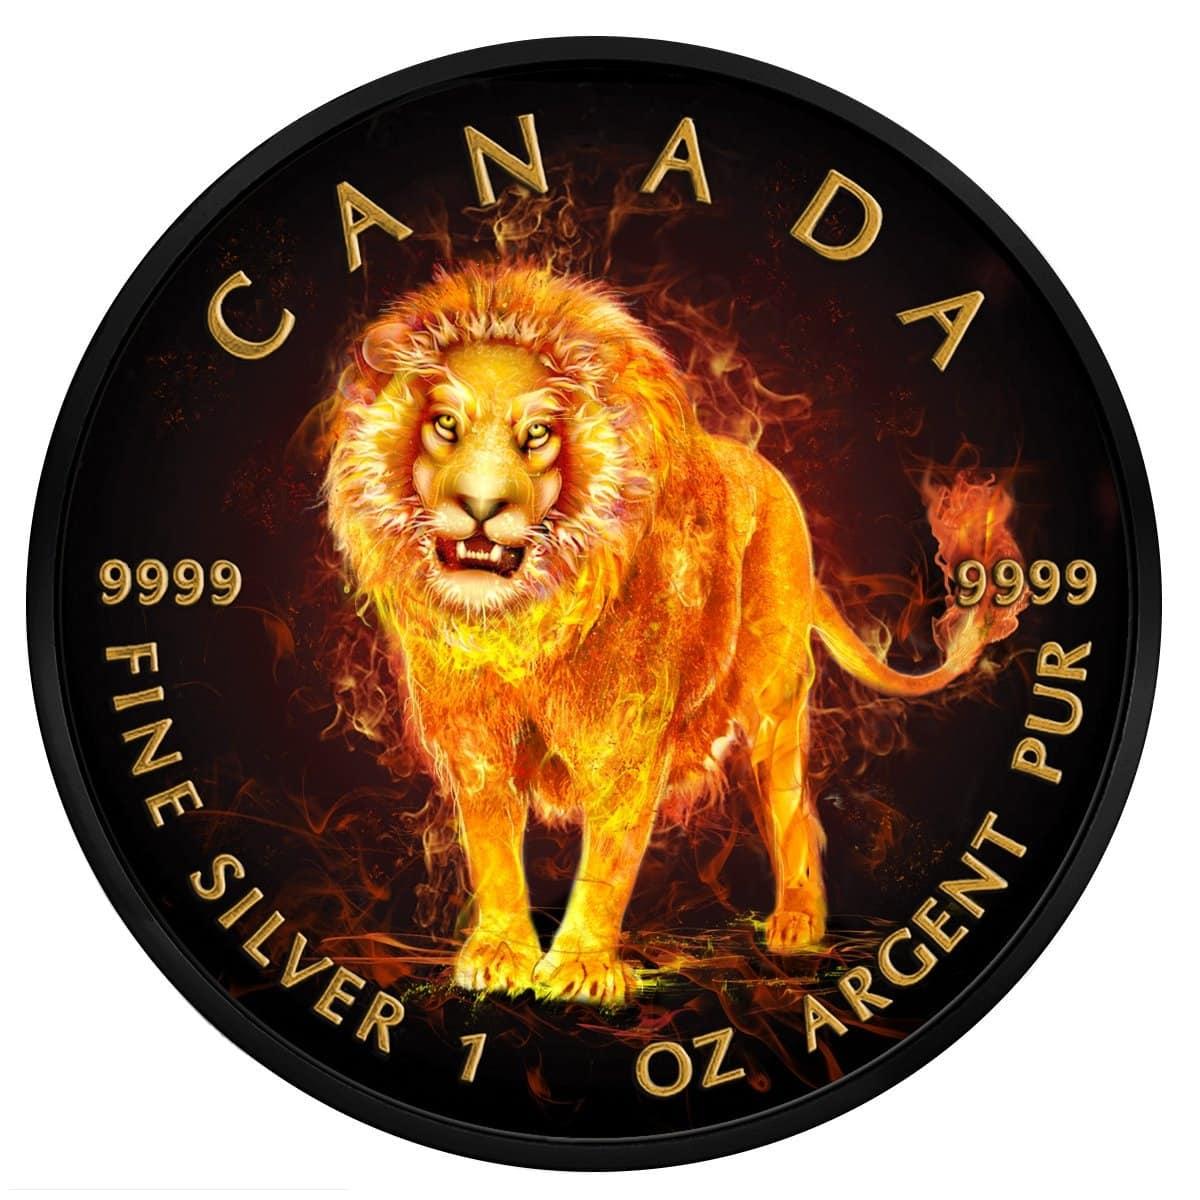 2018 Burning Animals - Lion Maple Leaf 1oz Silver Coin 1